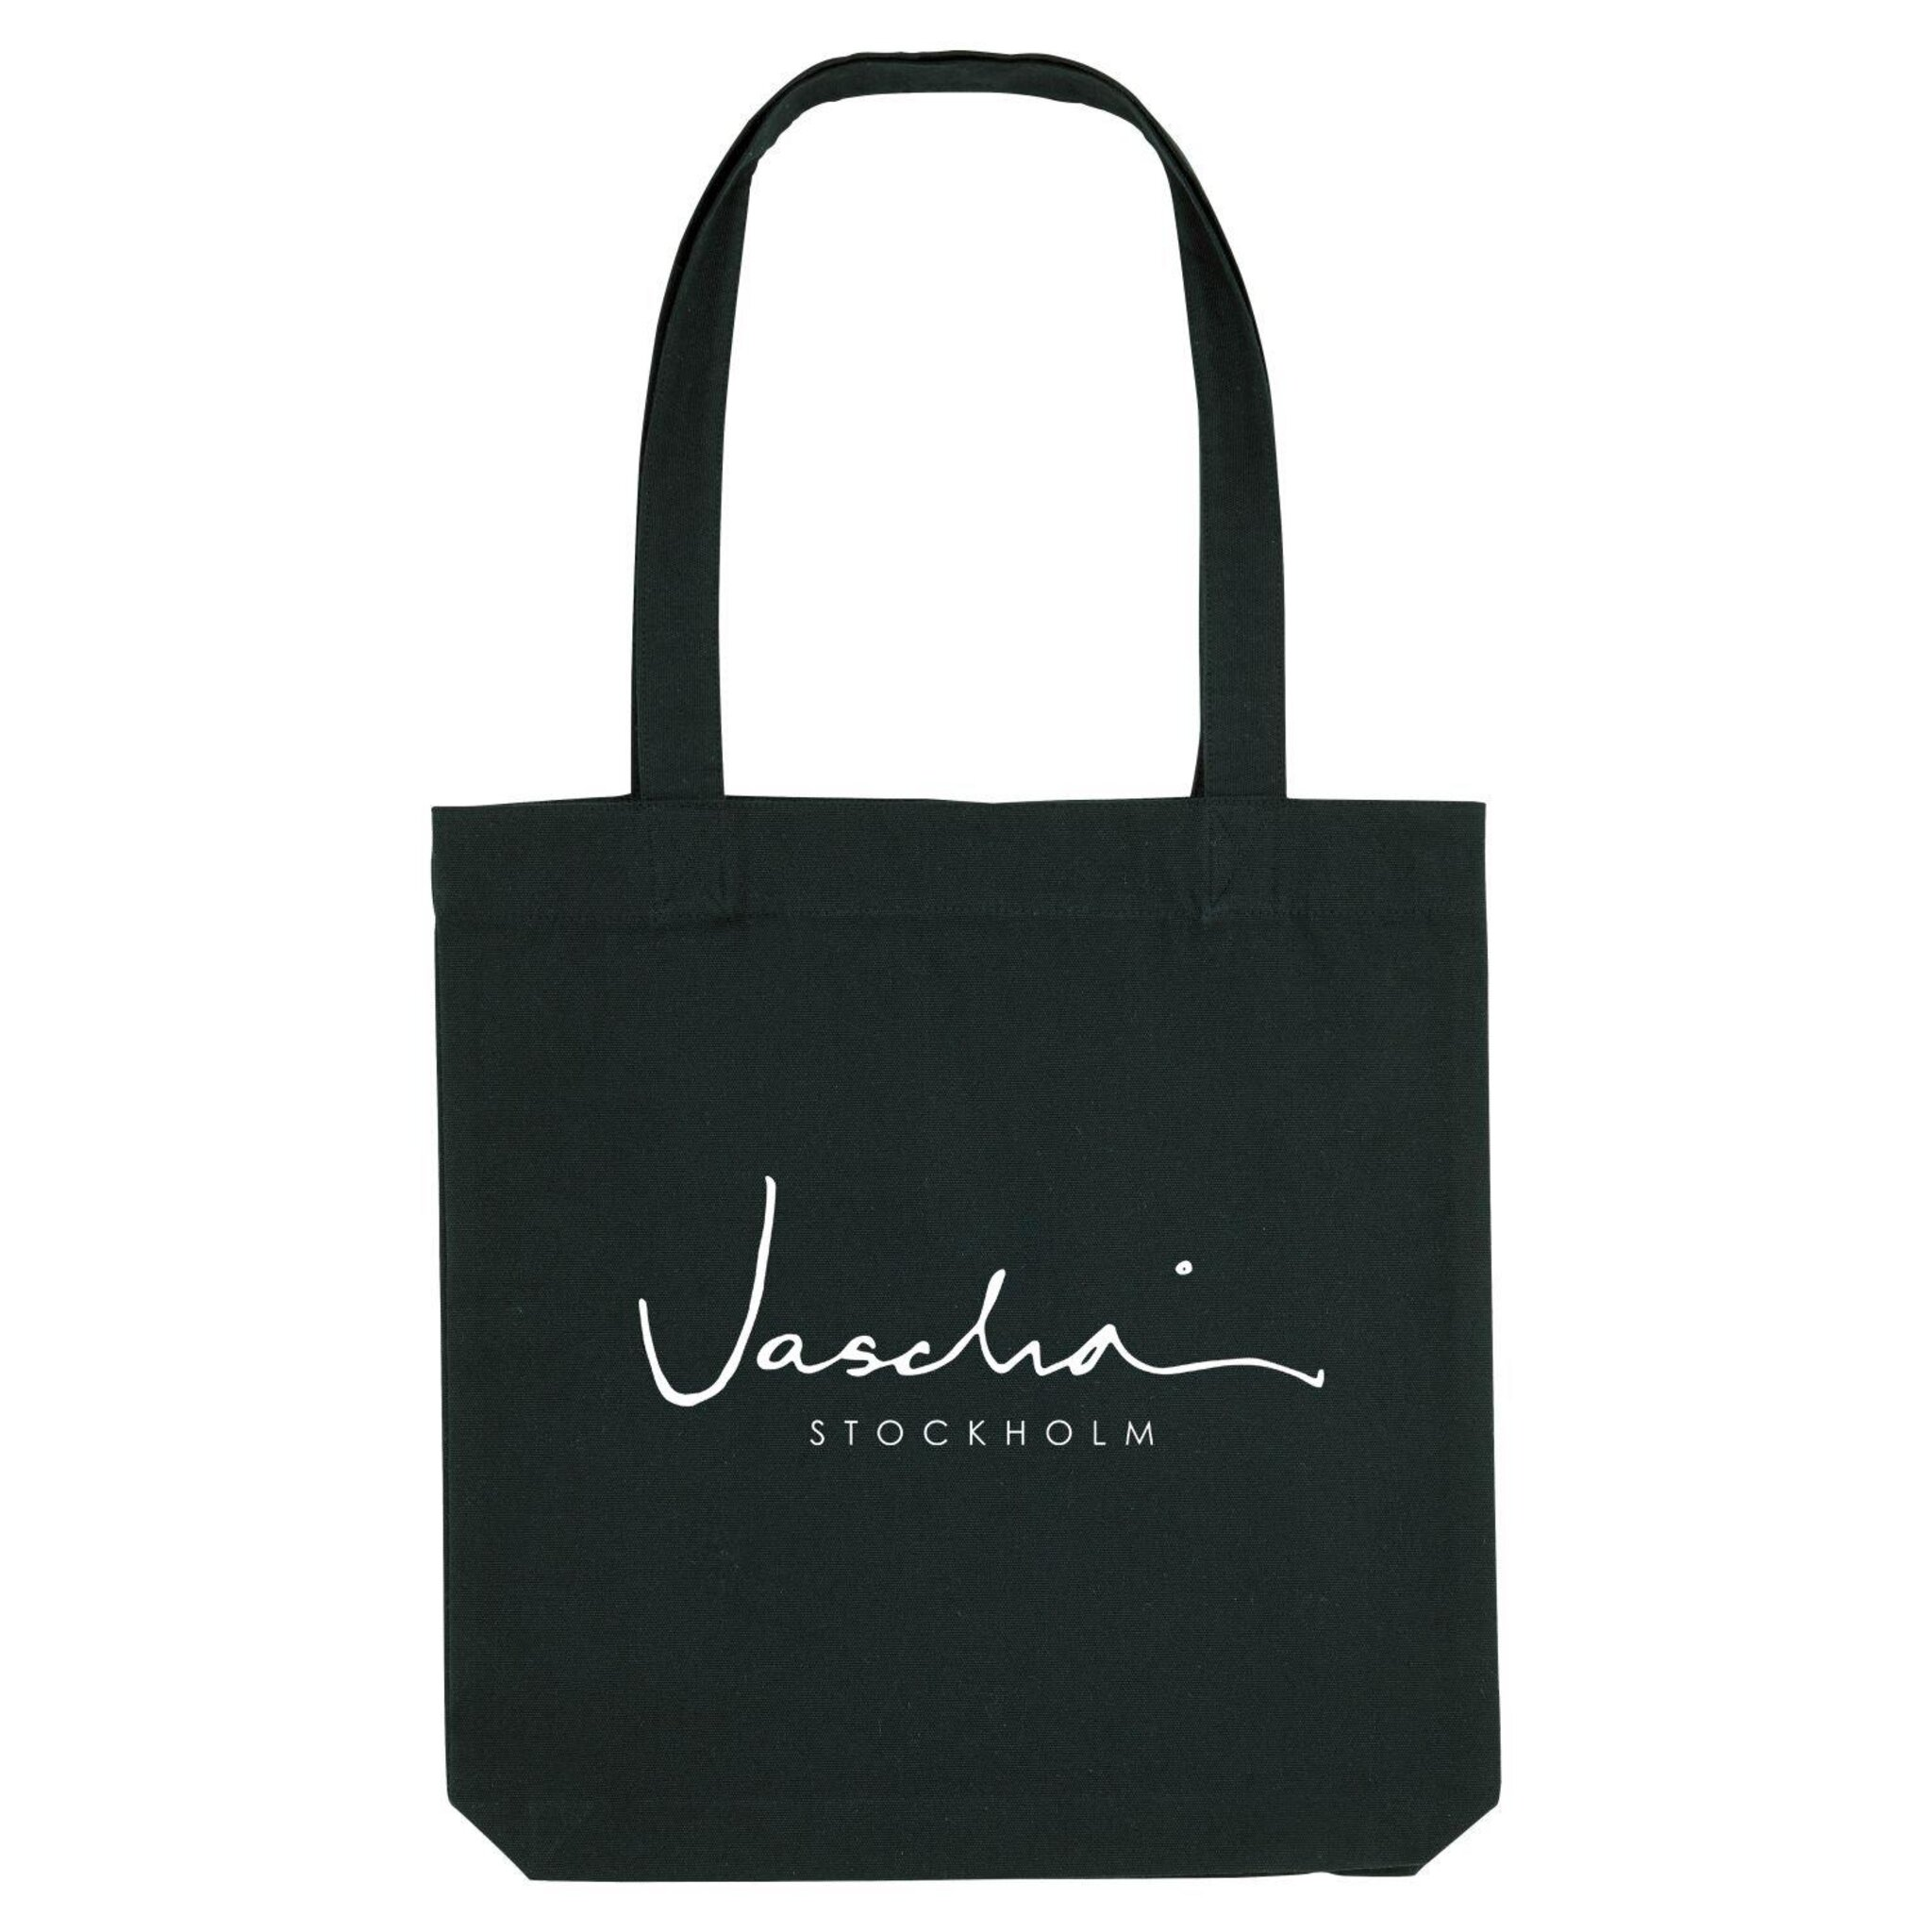 Jascha Stockholm - Tote Bag, ONESIZE